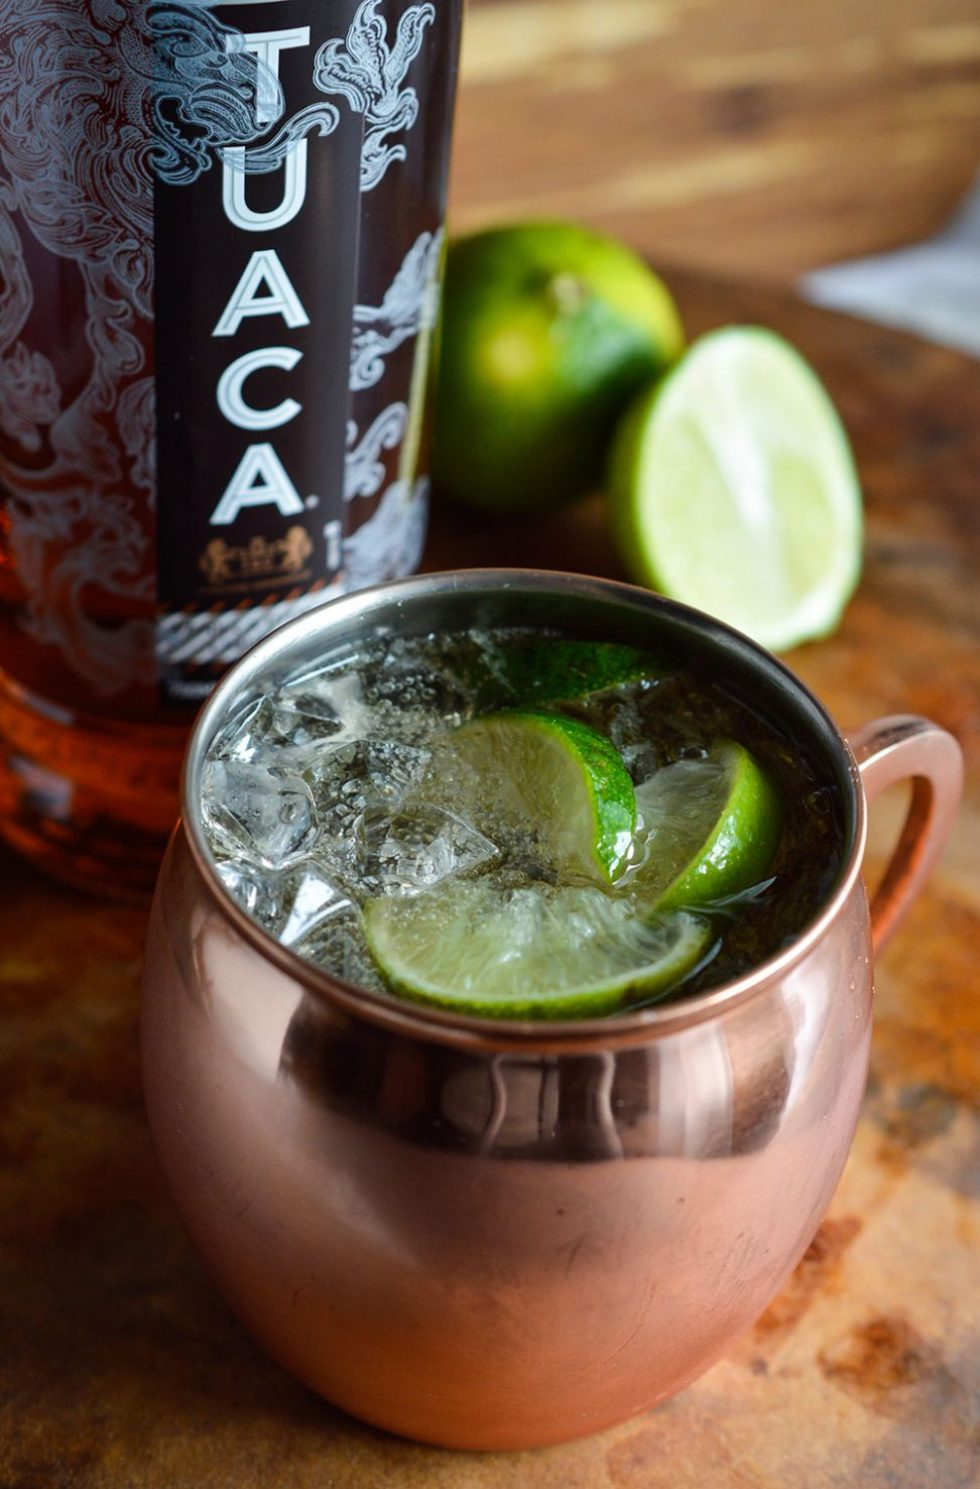 Tuaca Mule Cocktail